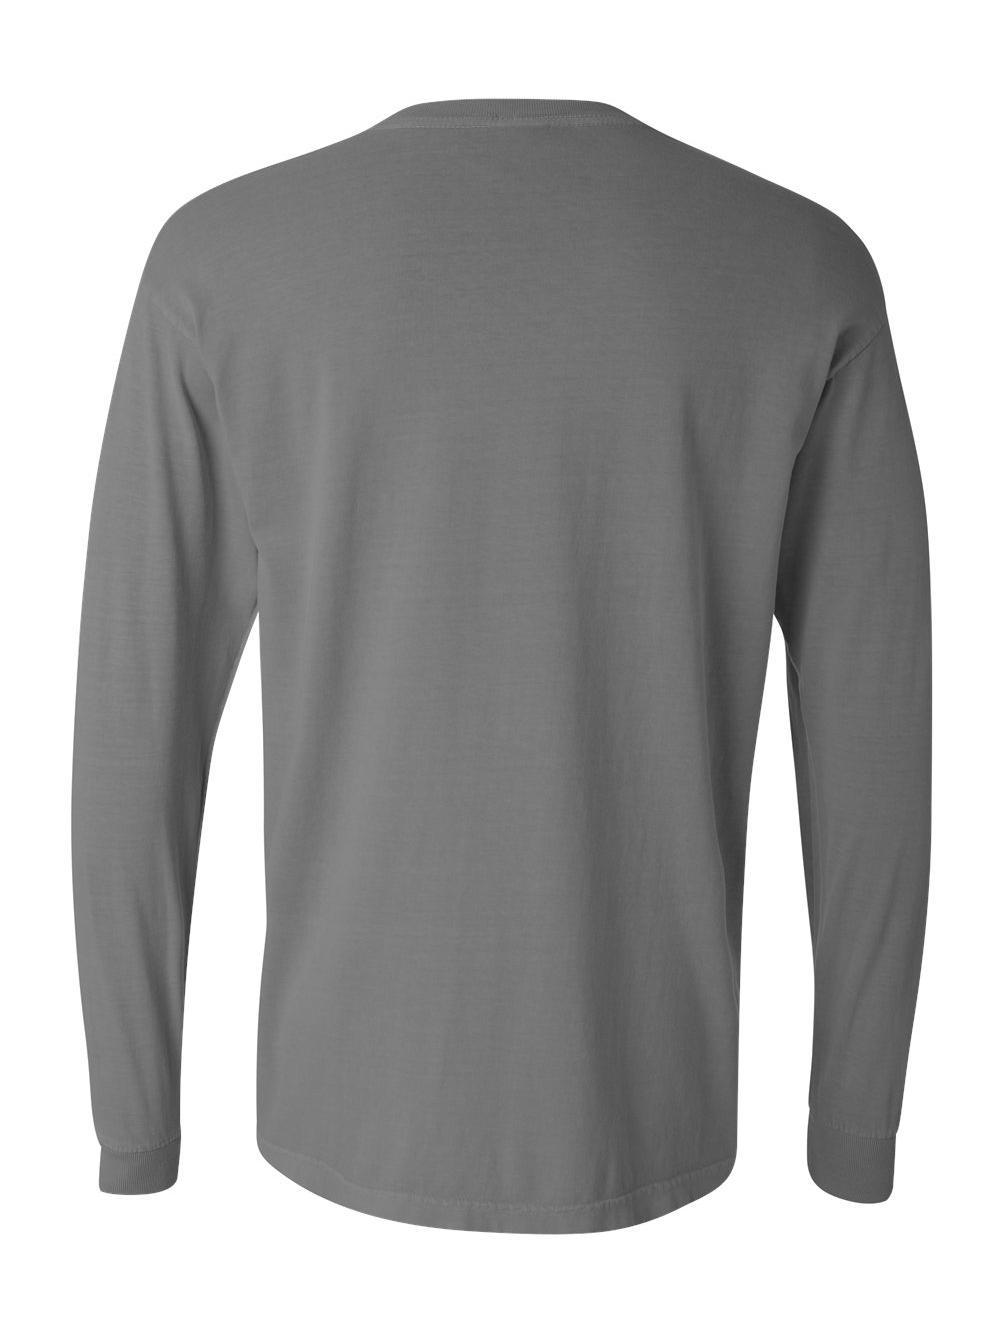 Comfort-Colors-Garment-Dyed-Heavyweight-Ringspun-Long-Sleeve-T-Shirt-6014 thumbnail 37